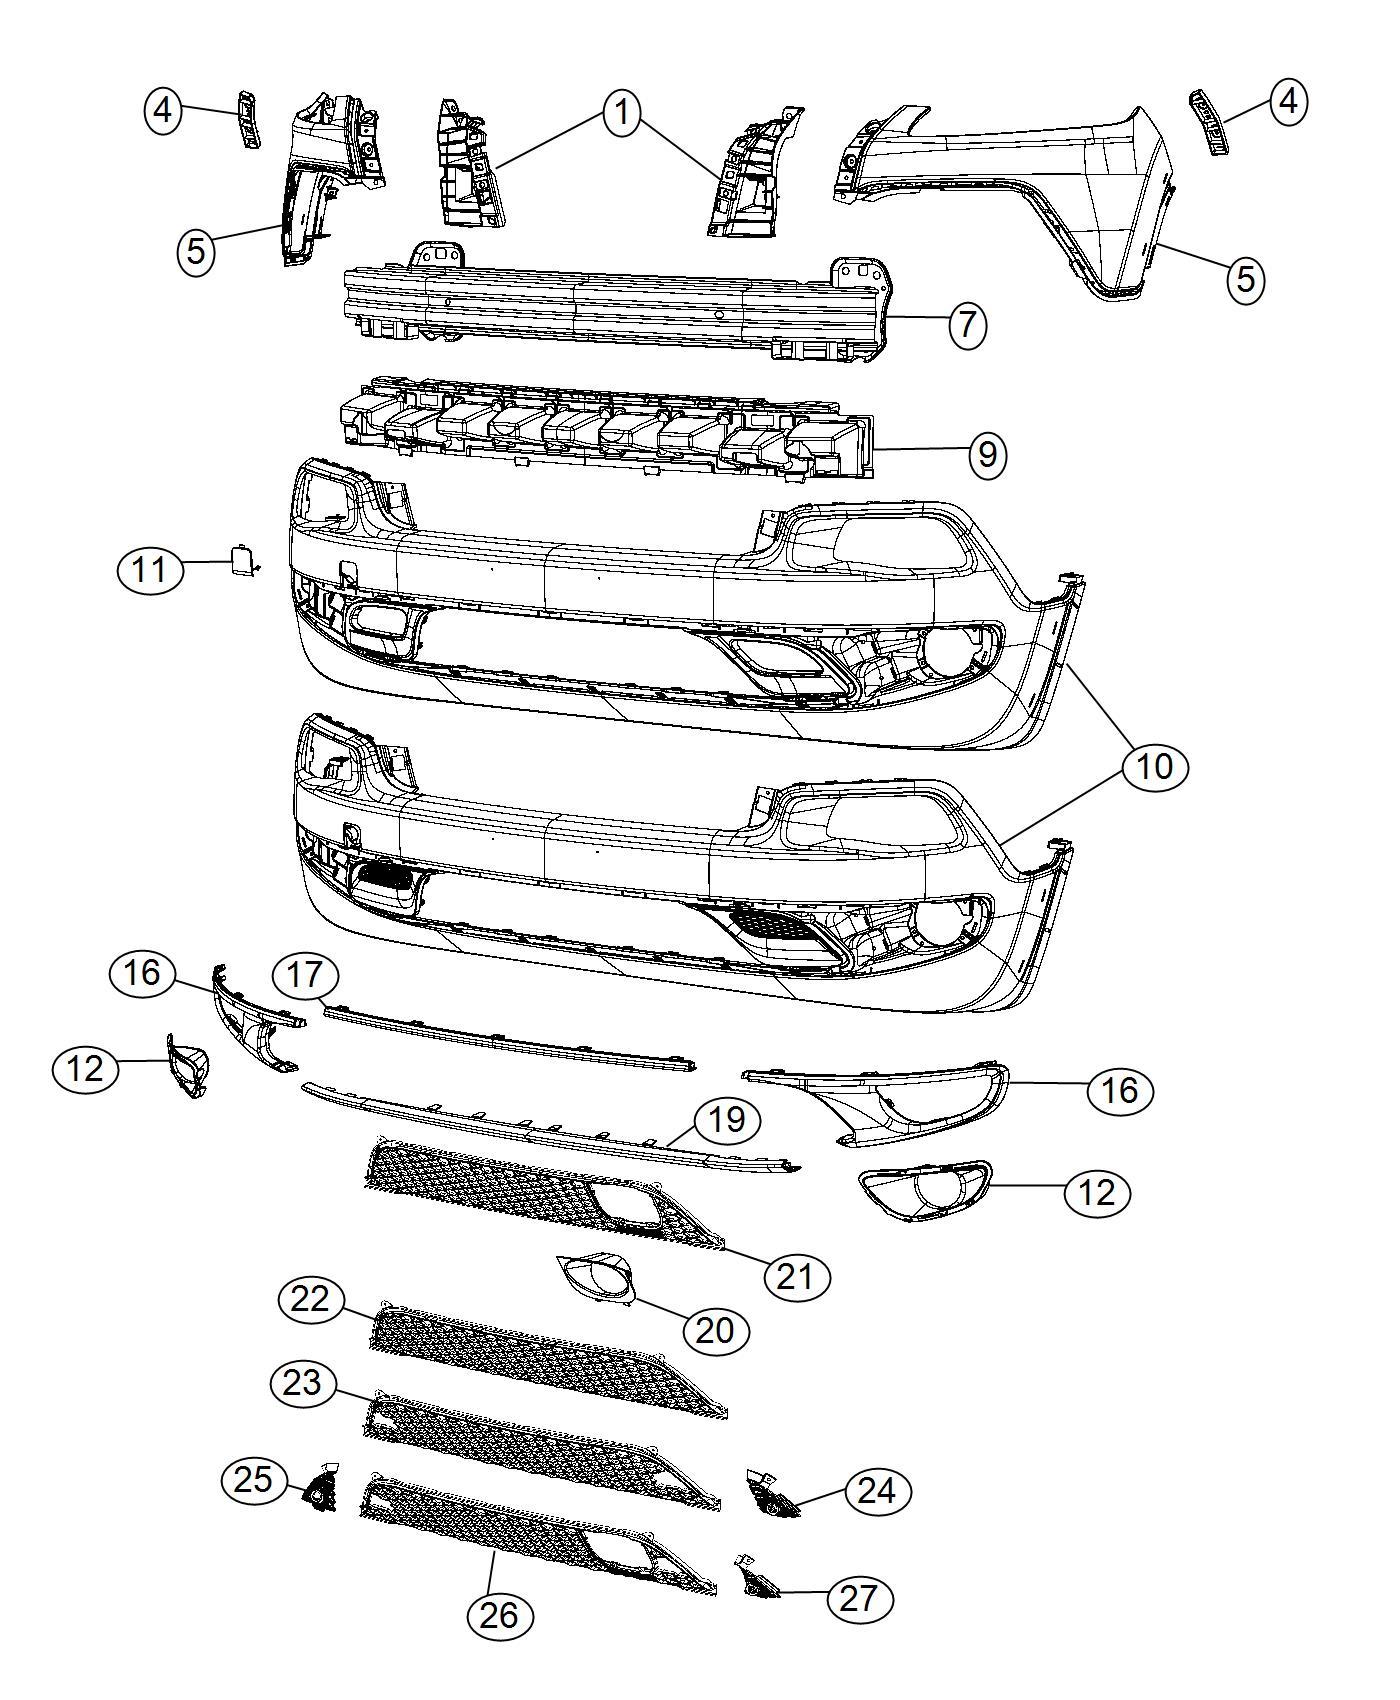 2017 Jeep Cherokee U-nut. M6x1.00x24.0. Belly pan attach